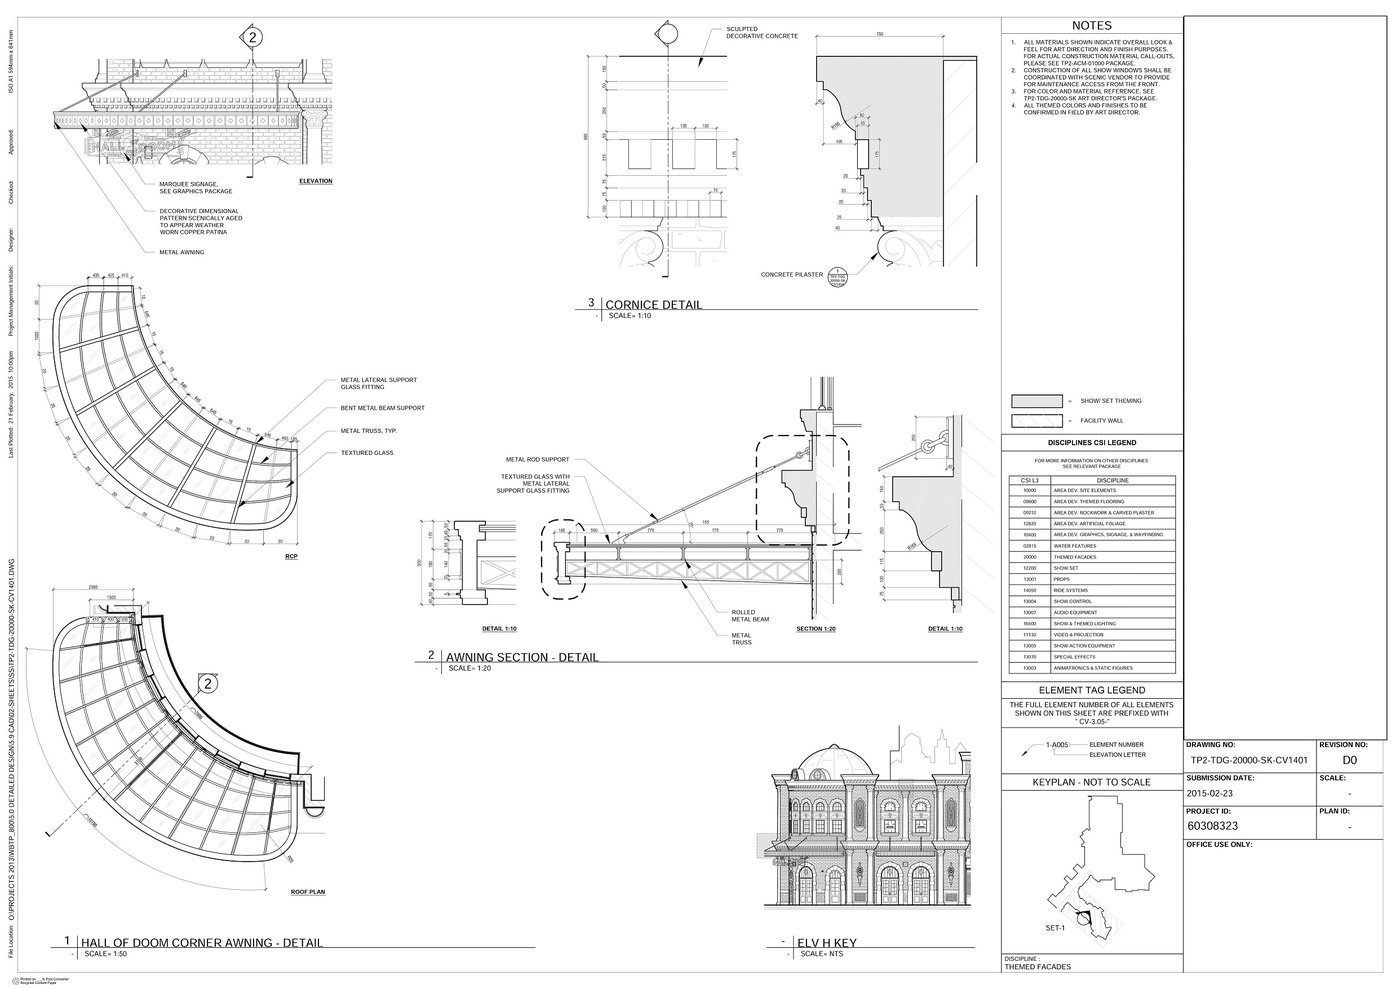 Revit BIM Detail Package : Architectural (UAE) by Dharmil